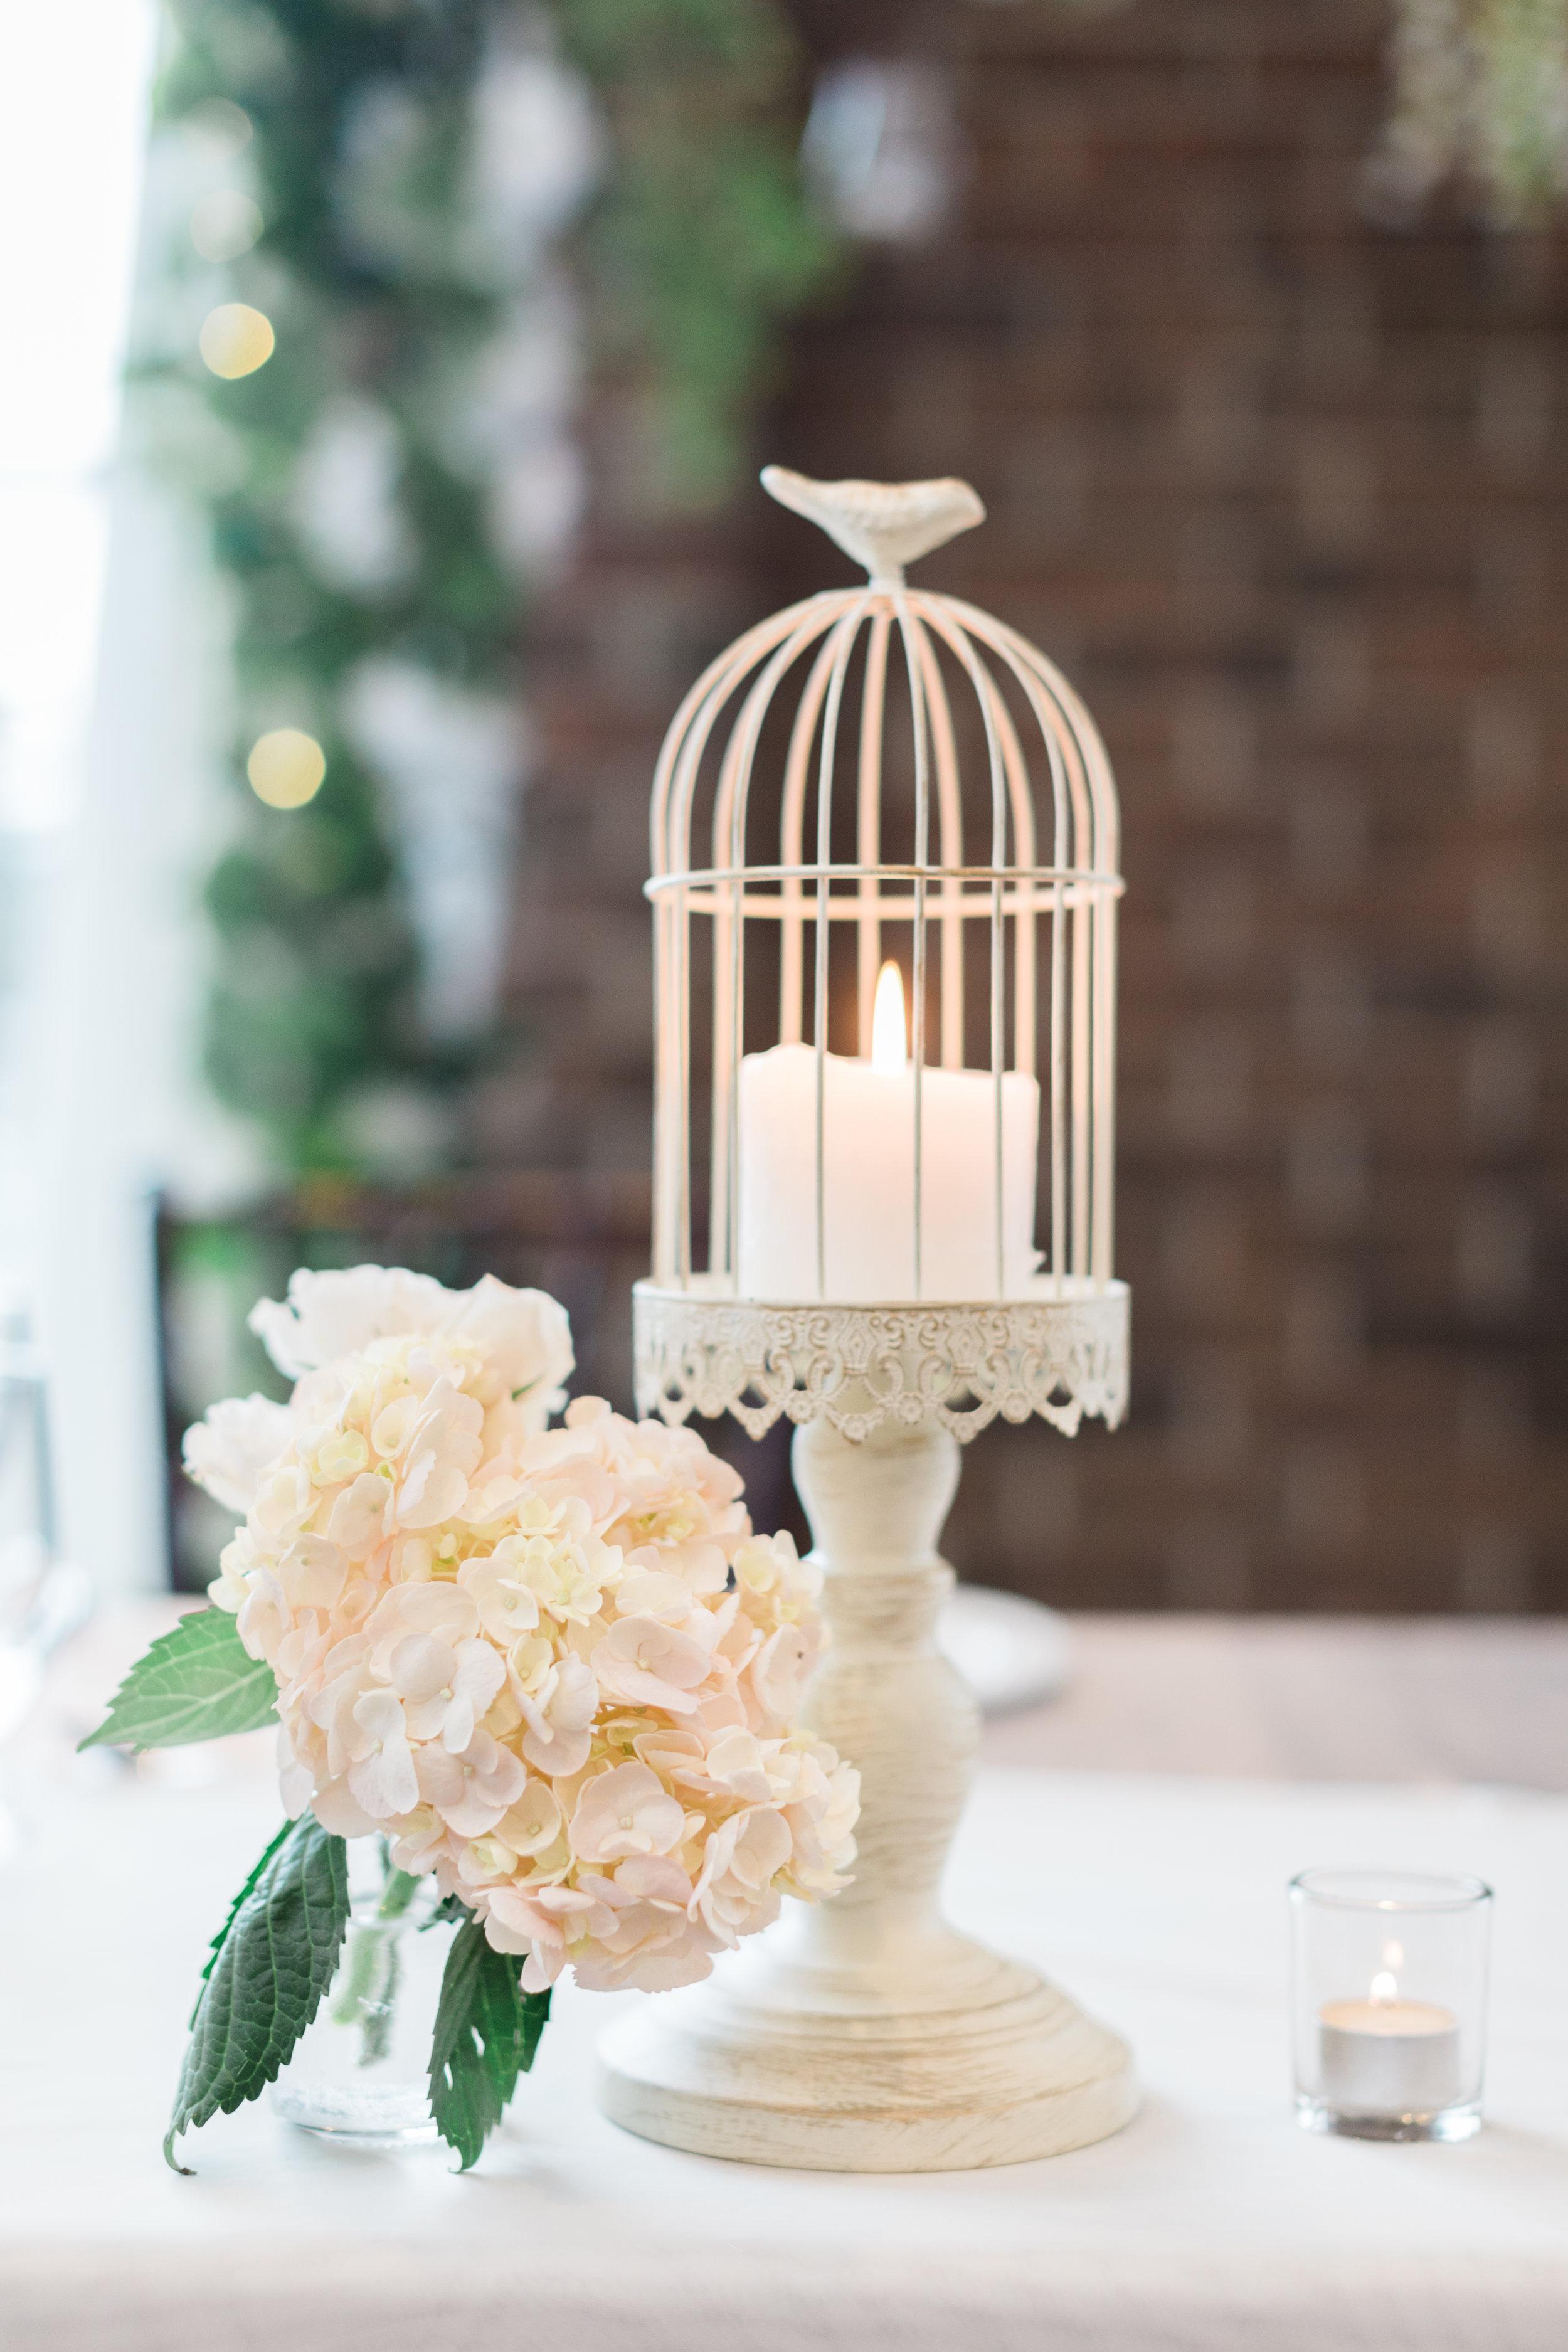 The Manor Winter Wedding - Reception-13.jpg